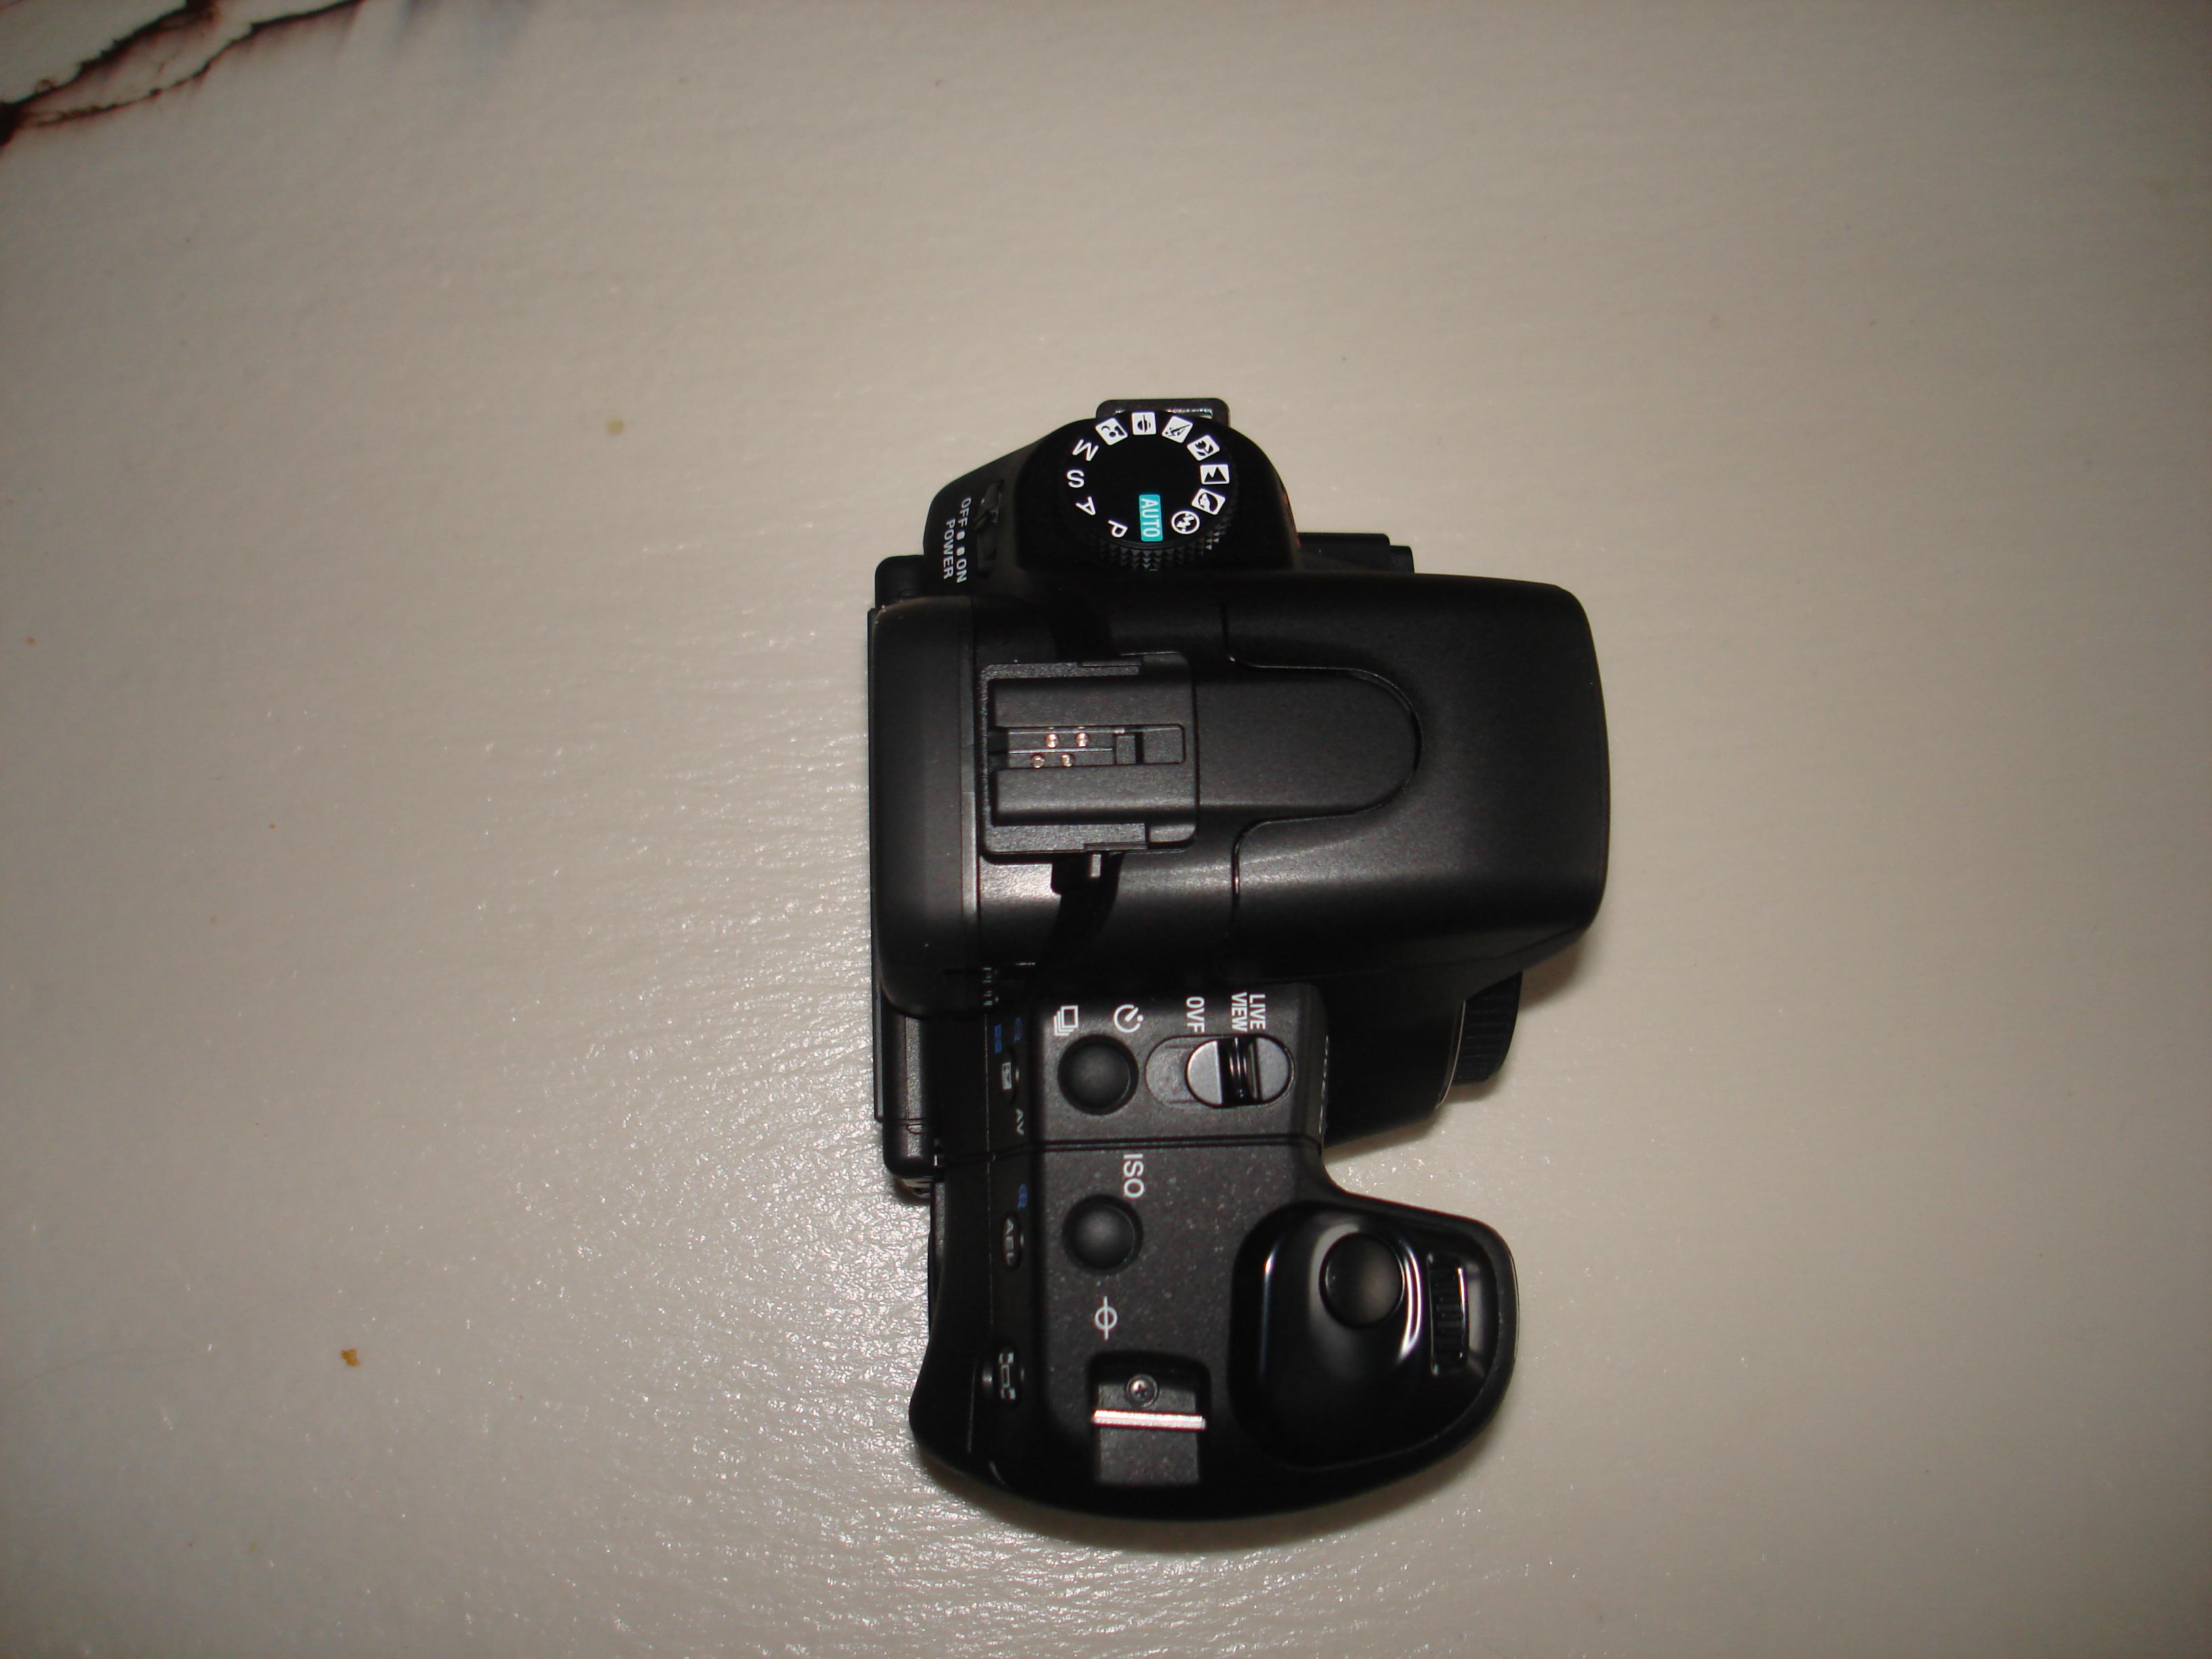 Camera Sony Dslr A300 Camera filesony dslr a300 jpg wikimedia commons jpg